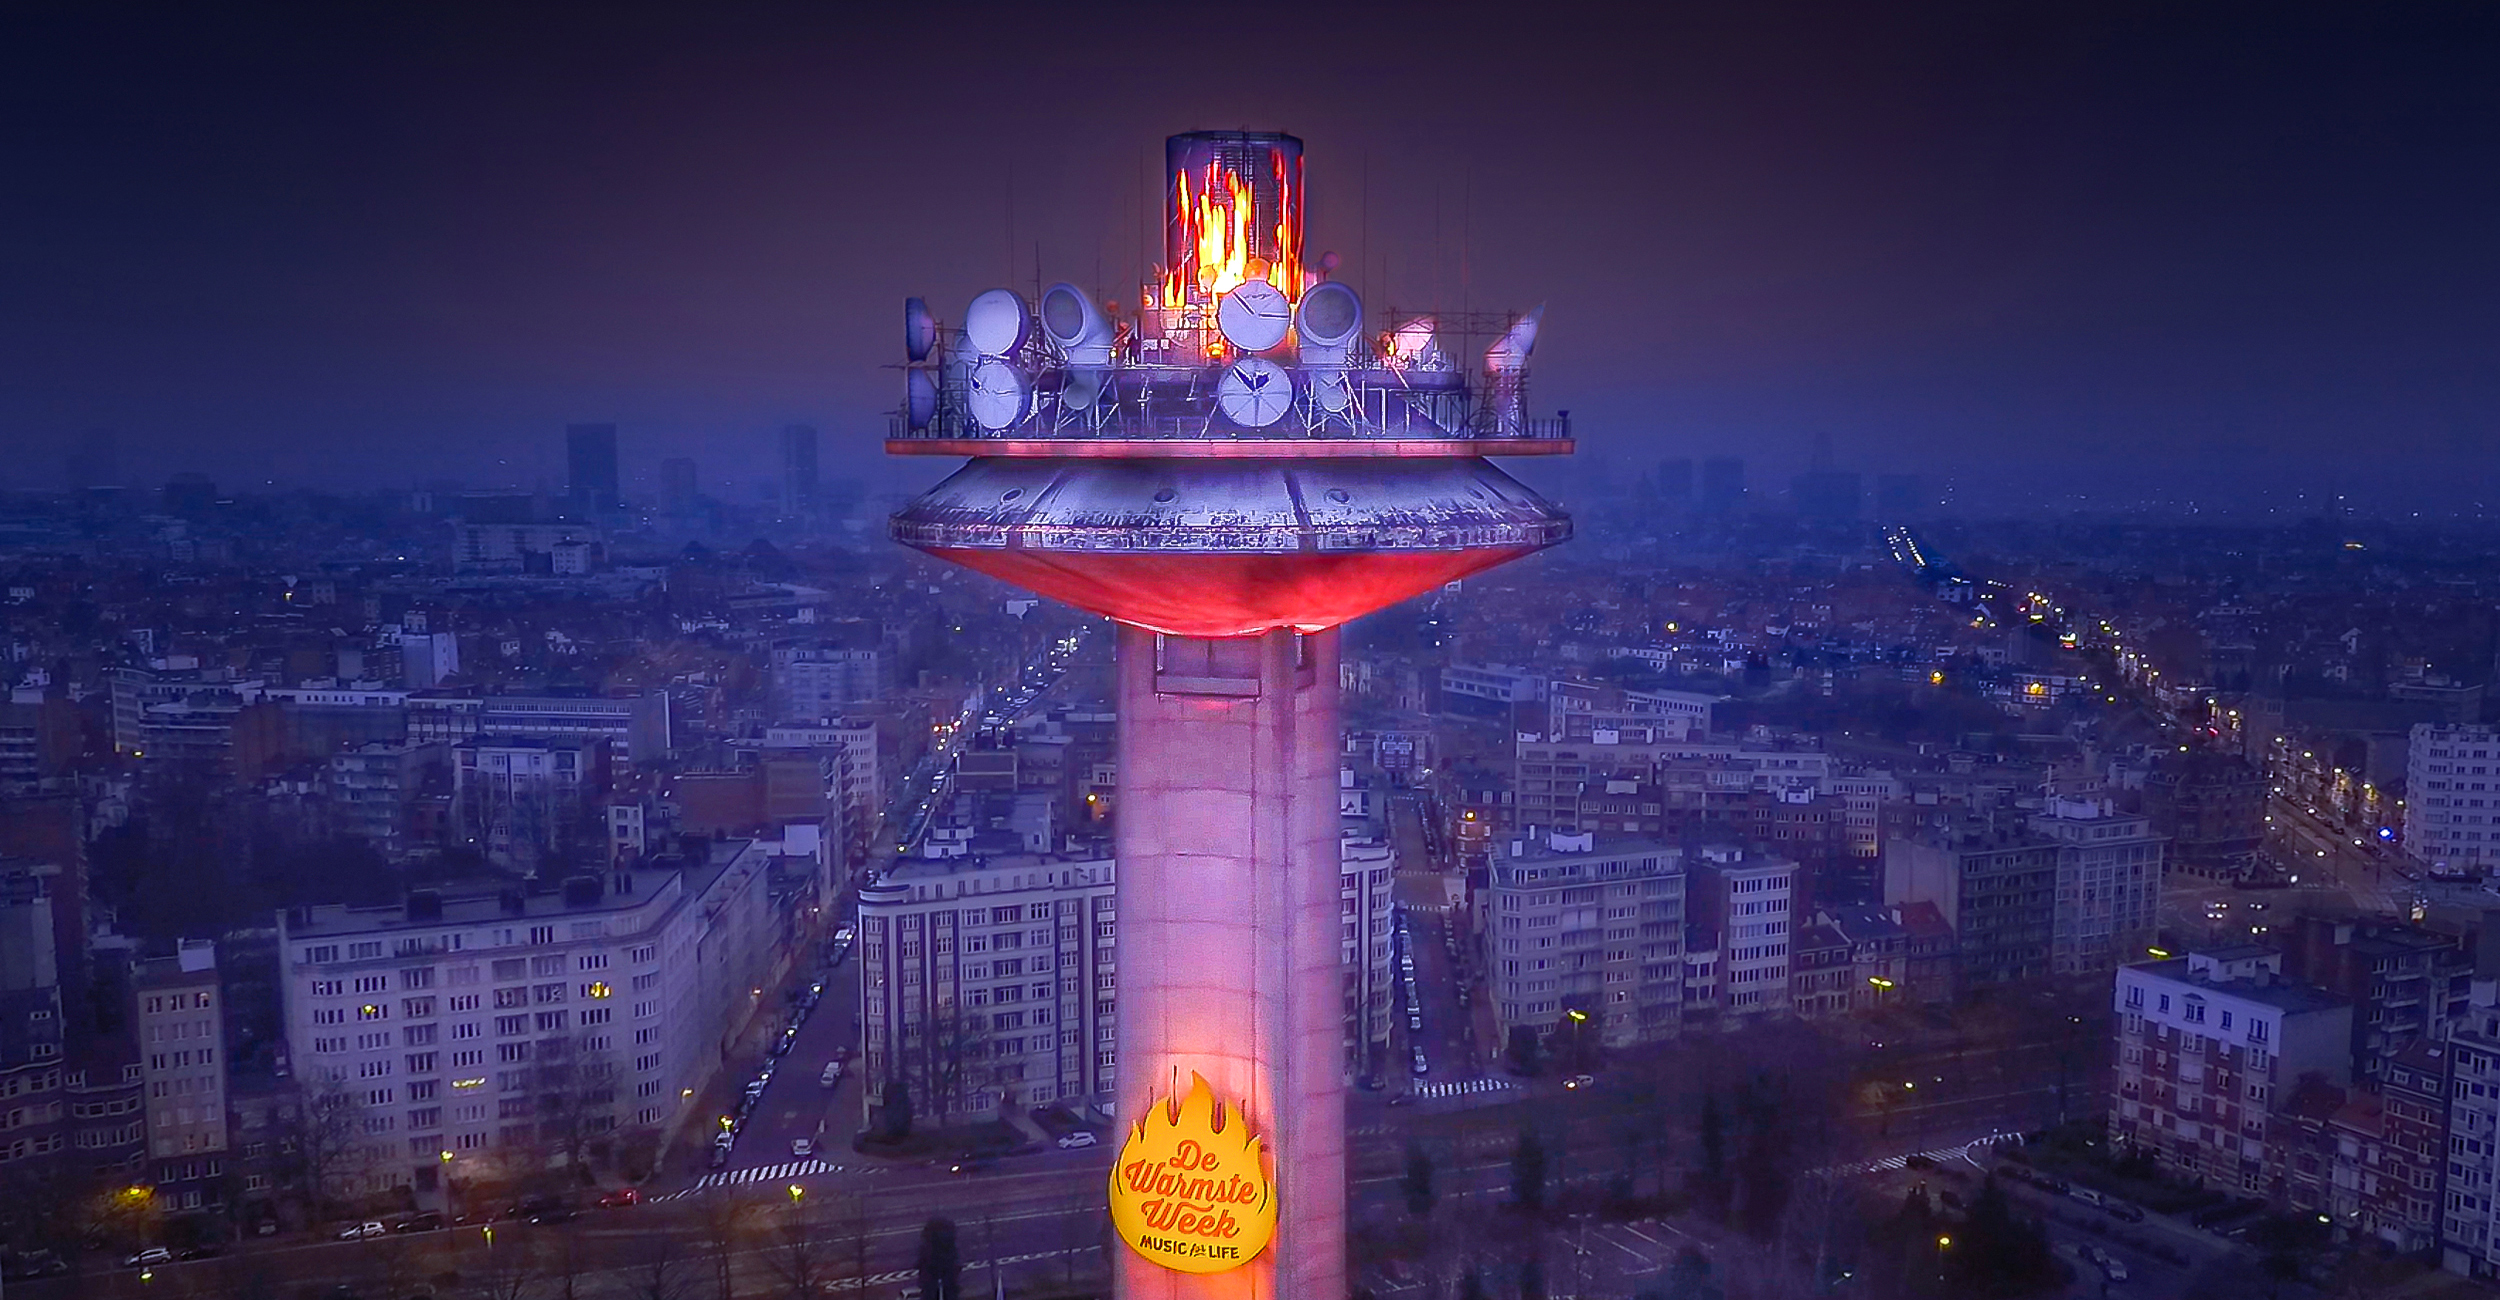 VRT toren warmste week hover-cam